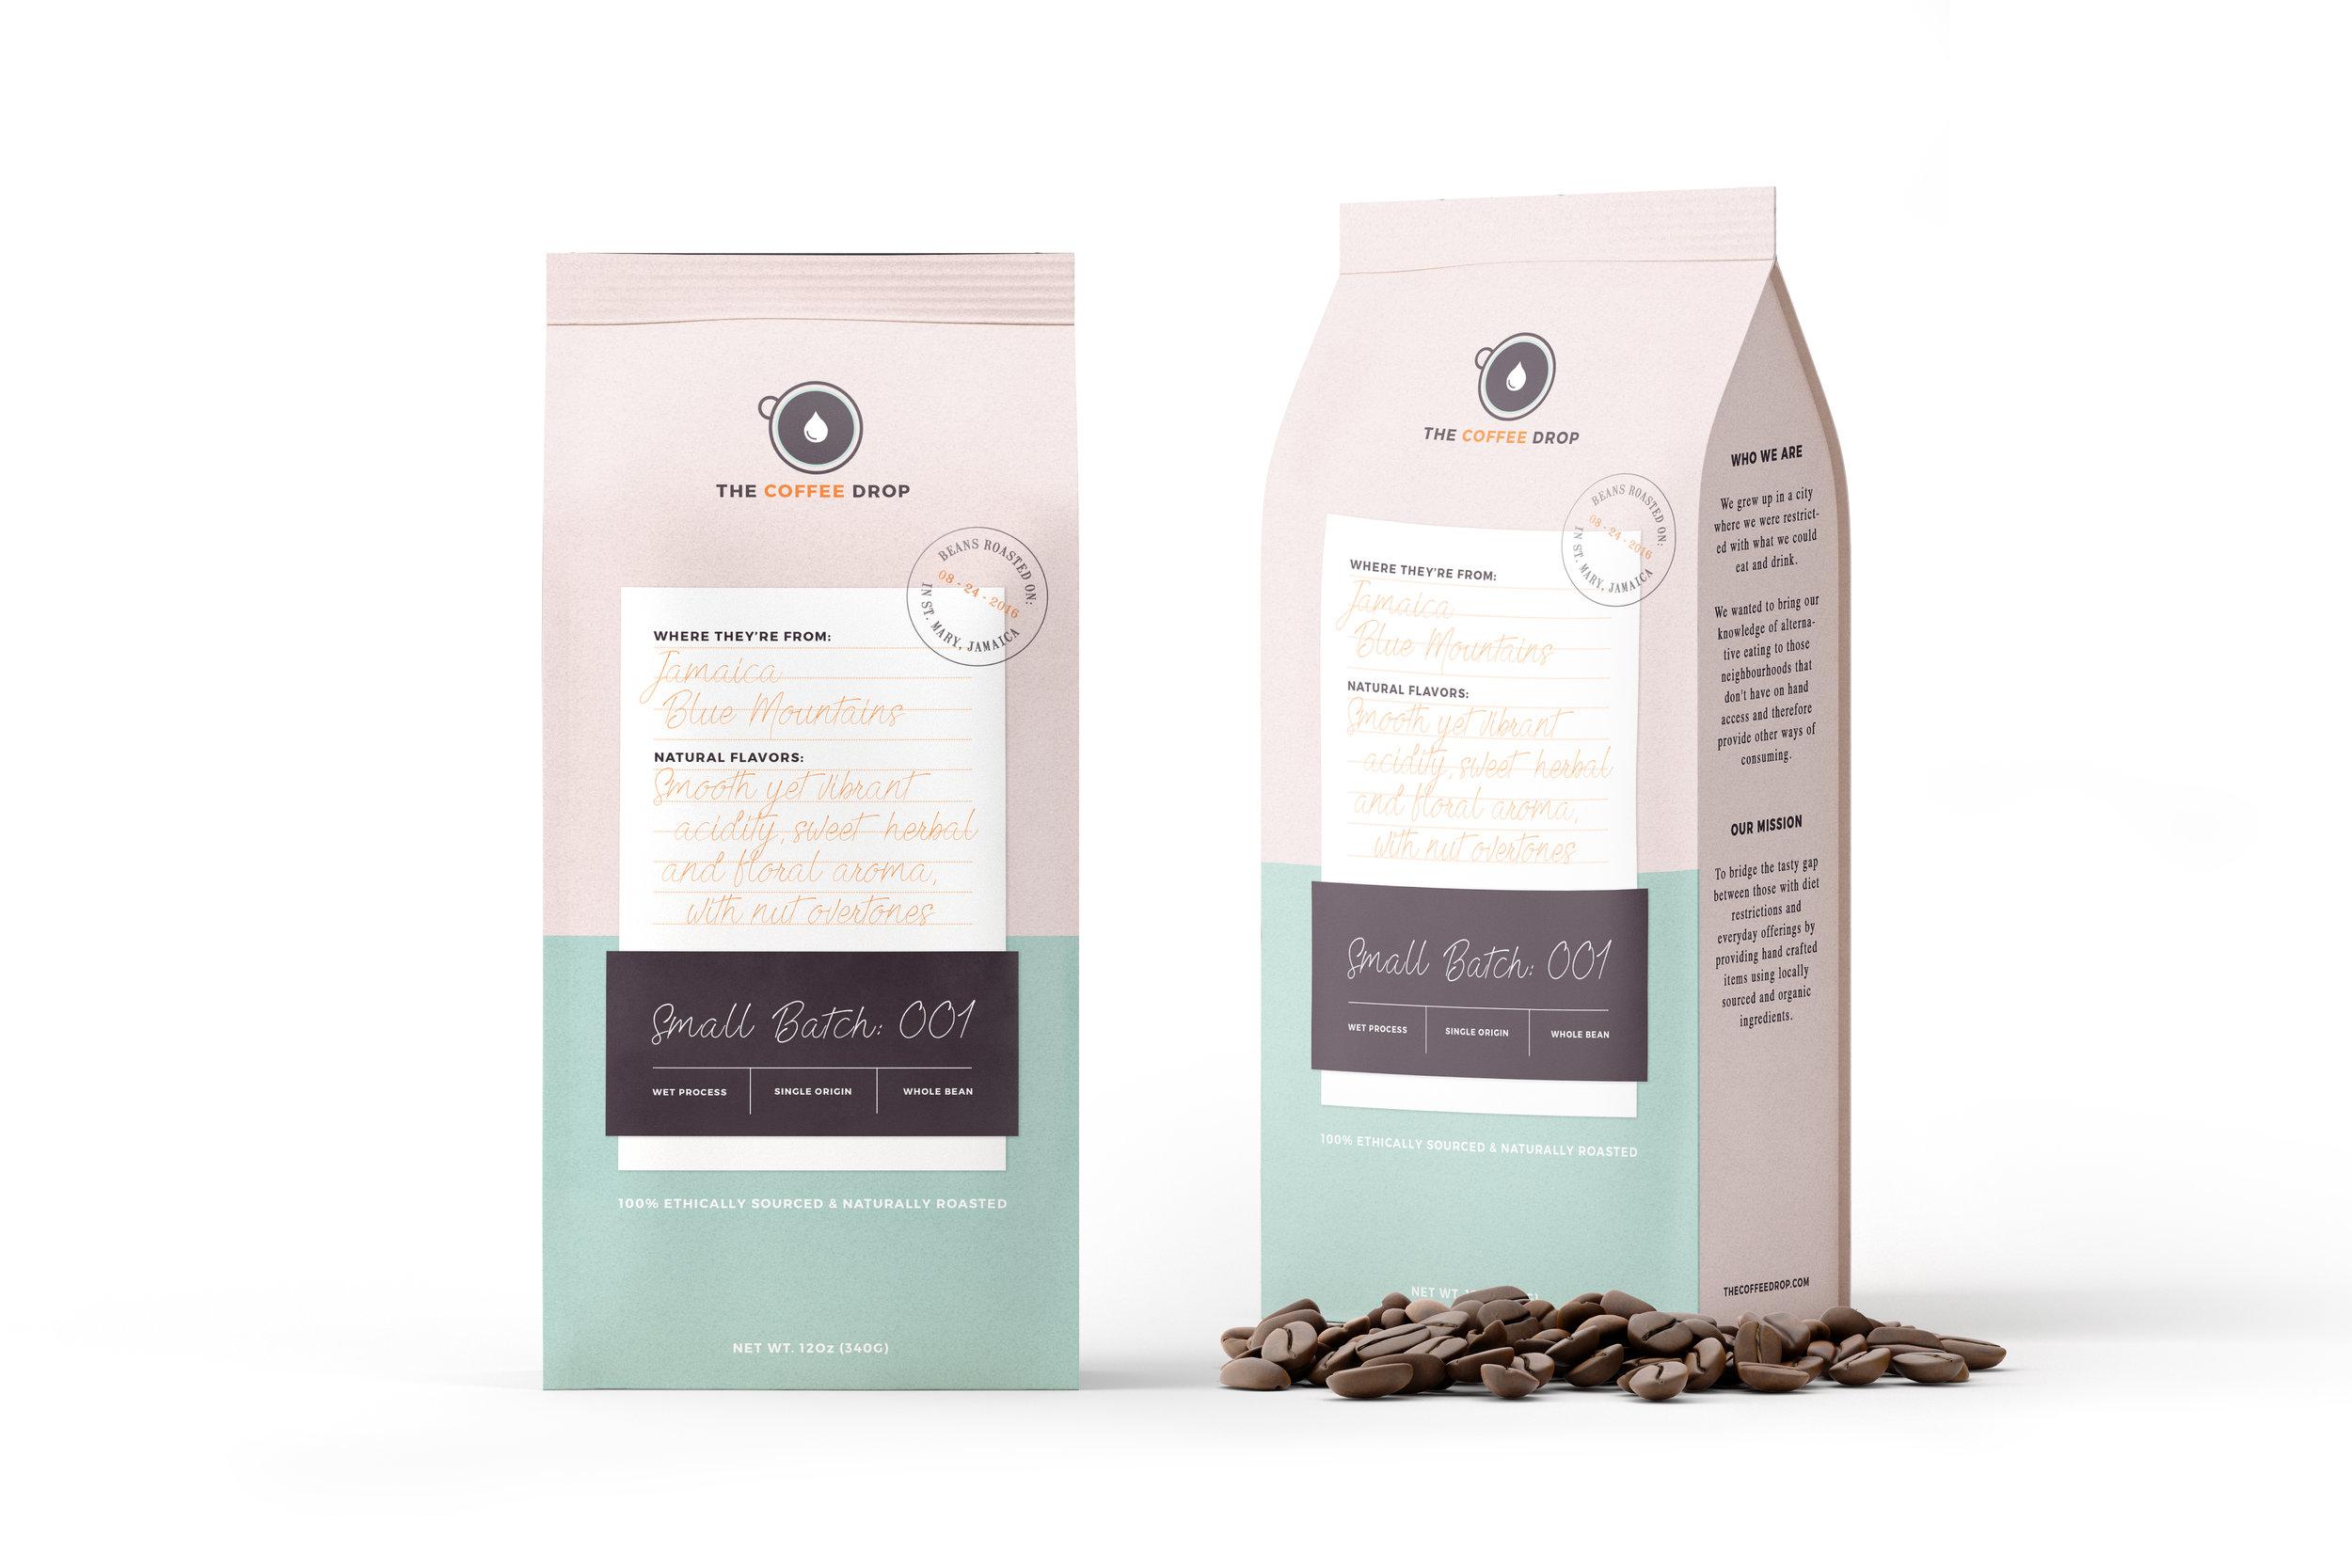 the coffee drop - naming, brand development, packaging design